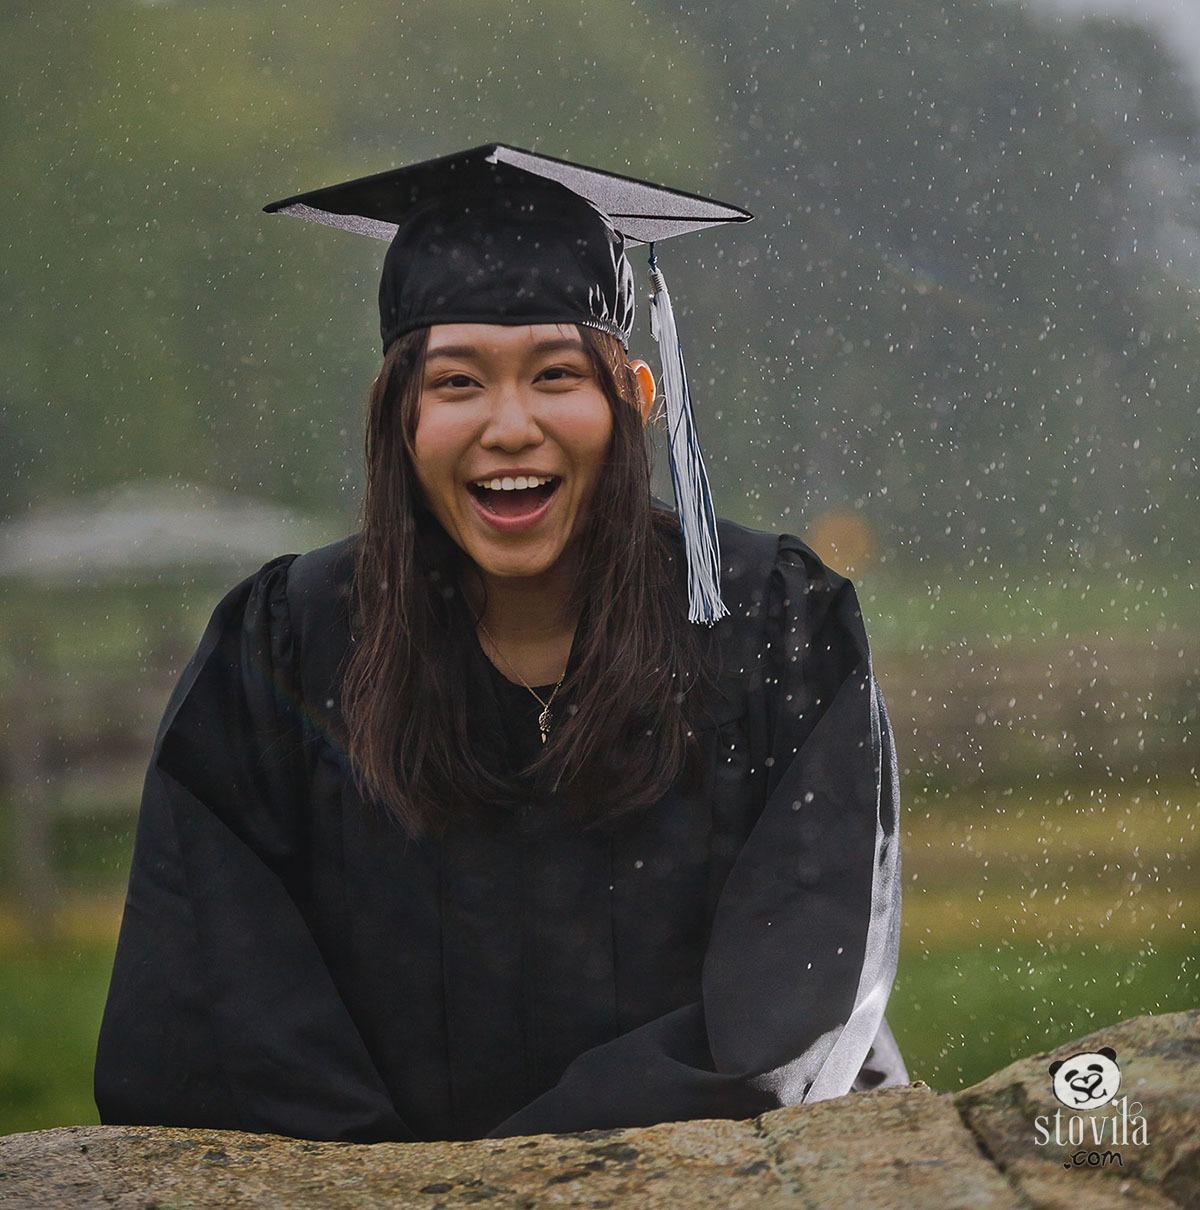 Irene Graduation! - Tendercorp Farm, Dover NH | Boston & NH Wedding Photographers - STOVILA // Modern Professional Affordable 7